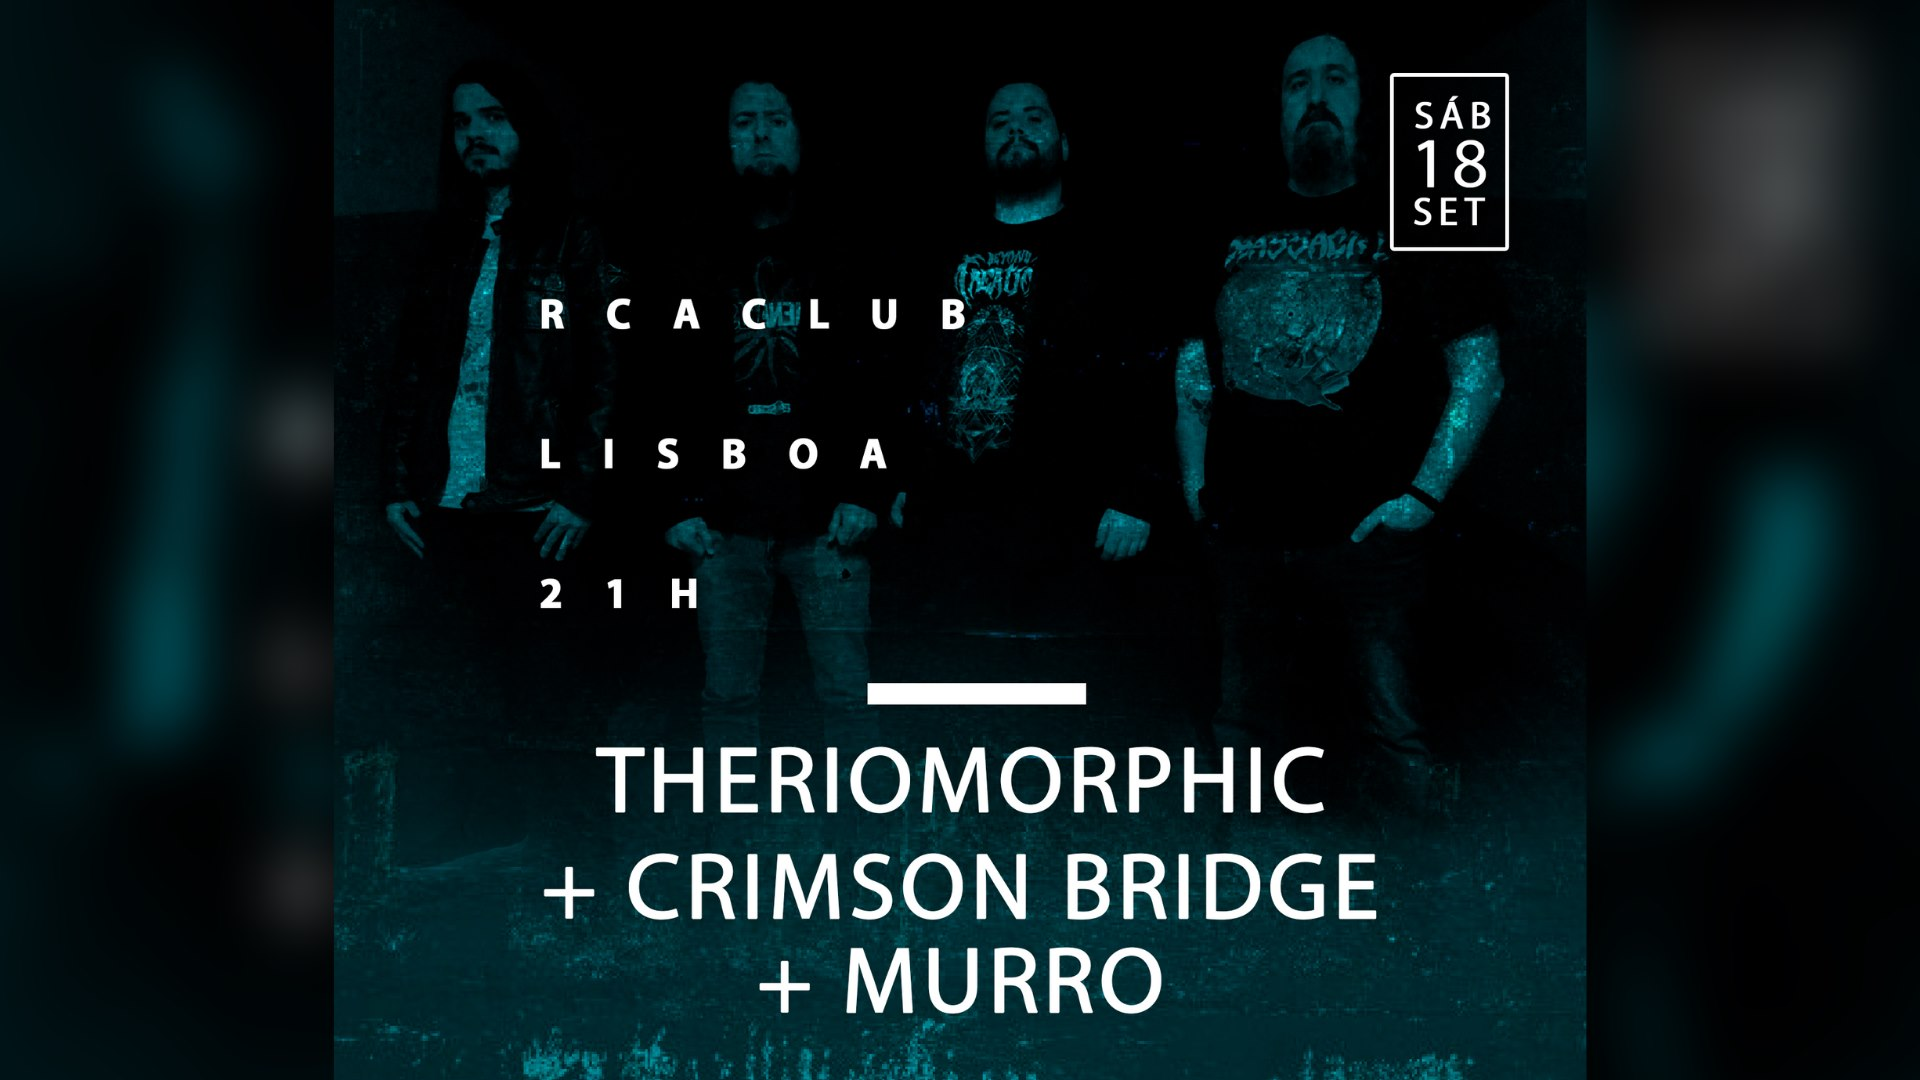 THERIOMORPHIC + CRIMSON BRIDGE + MURRO